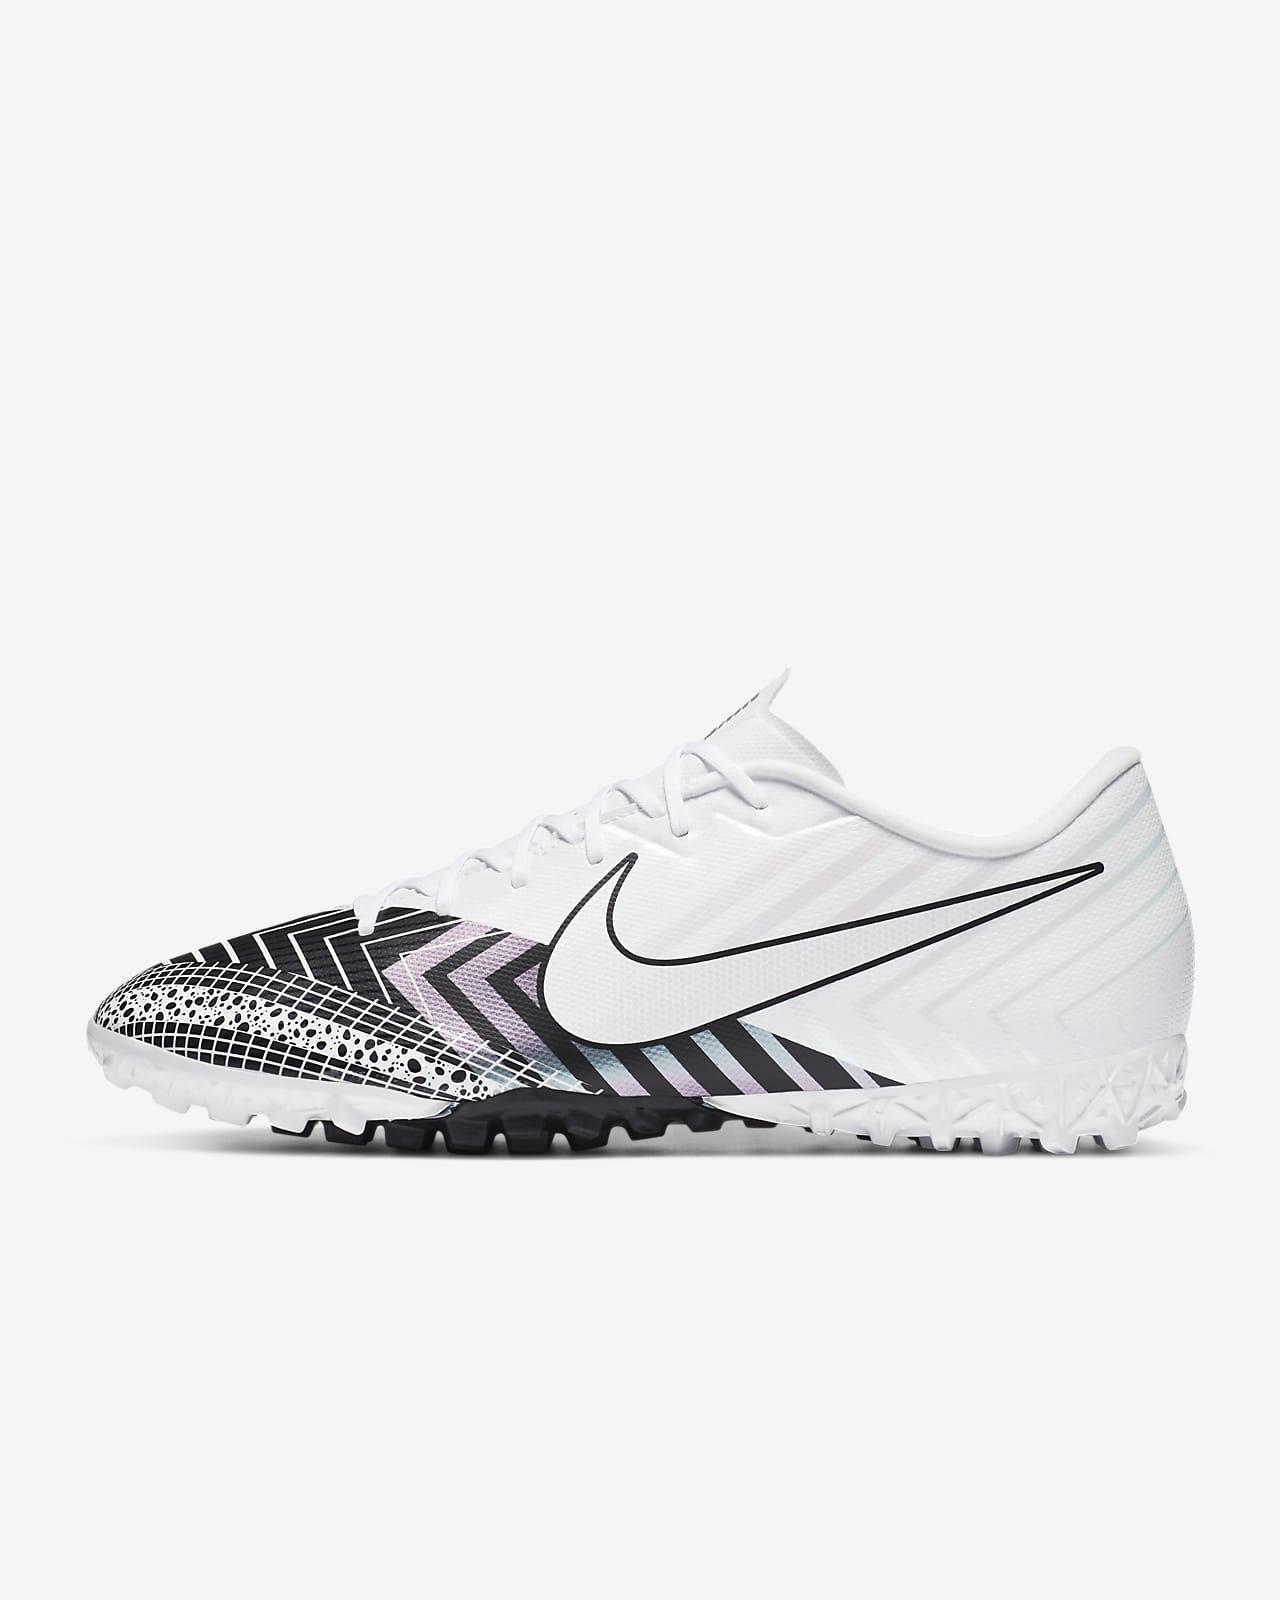 Nike Mercurial Vapor 13 Academy MDS TF Artificial-Turf Football Shoe